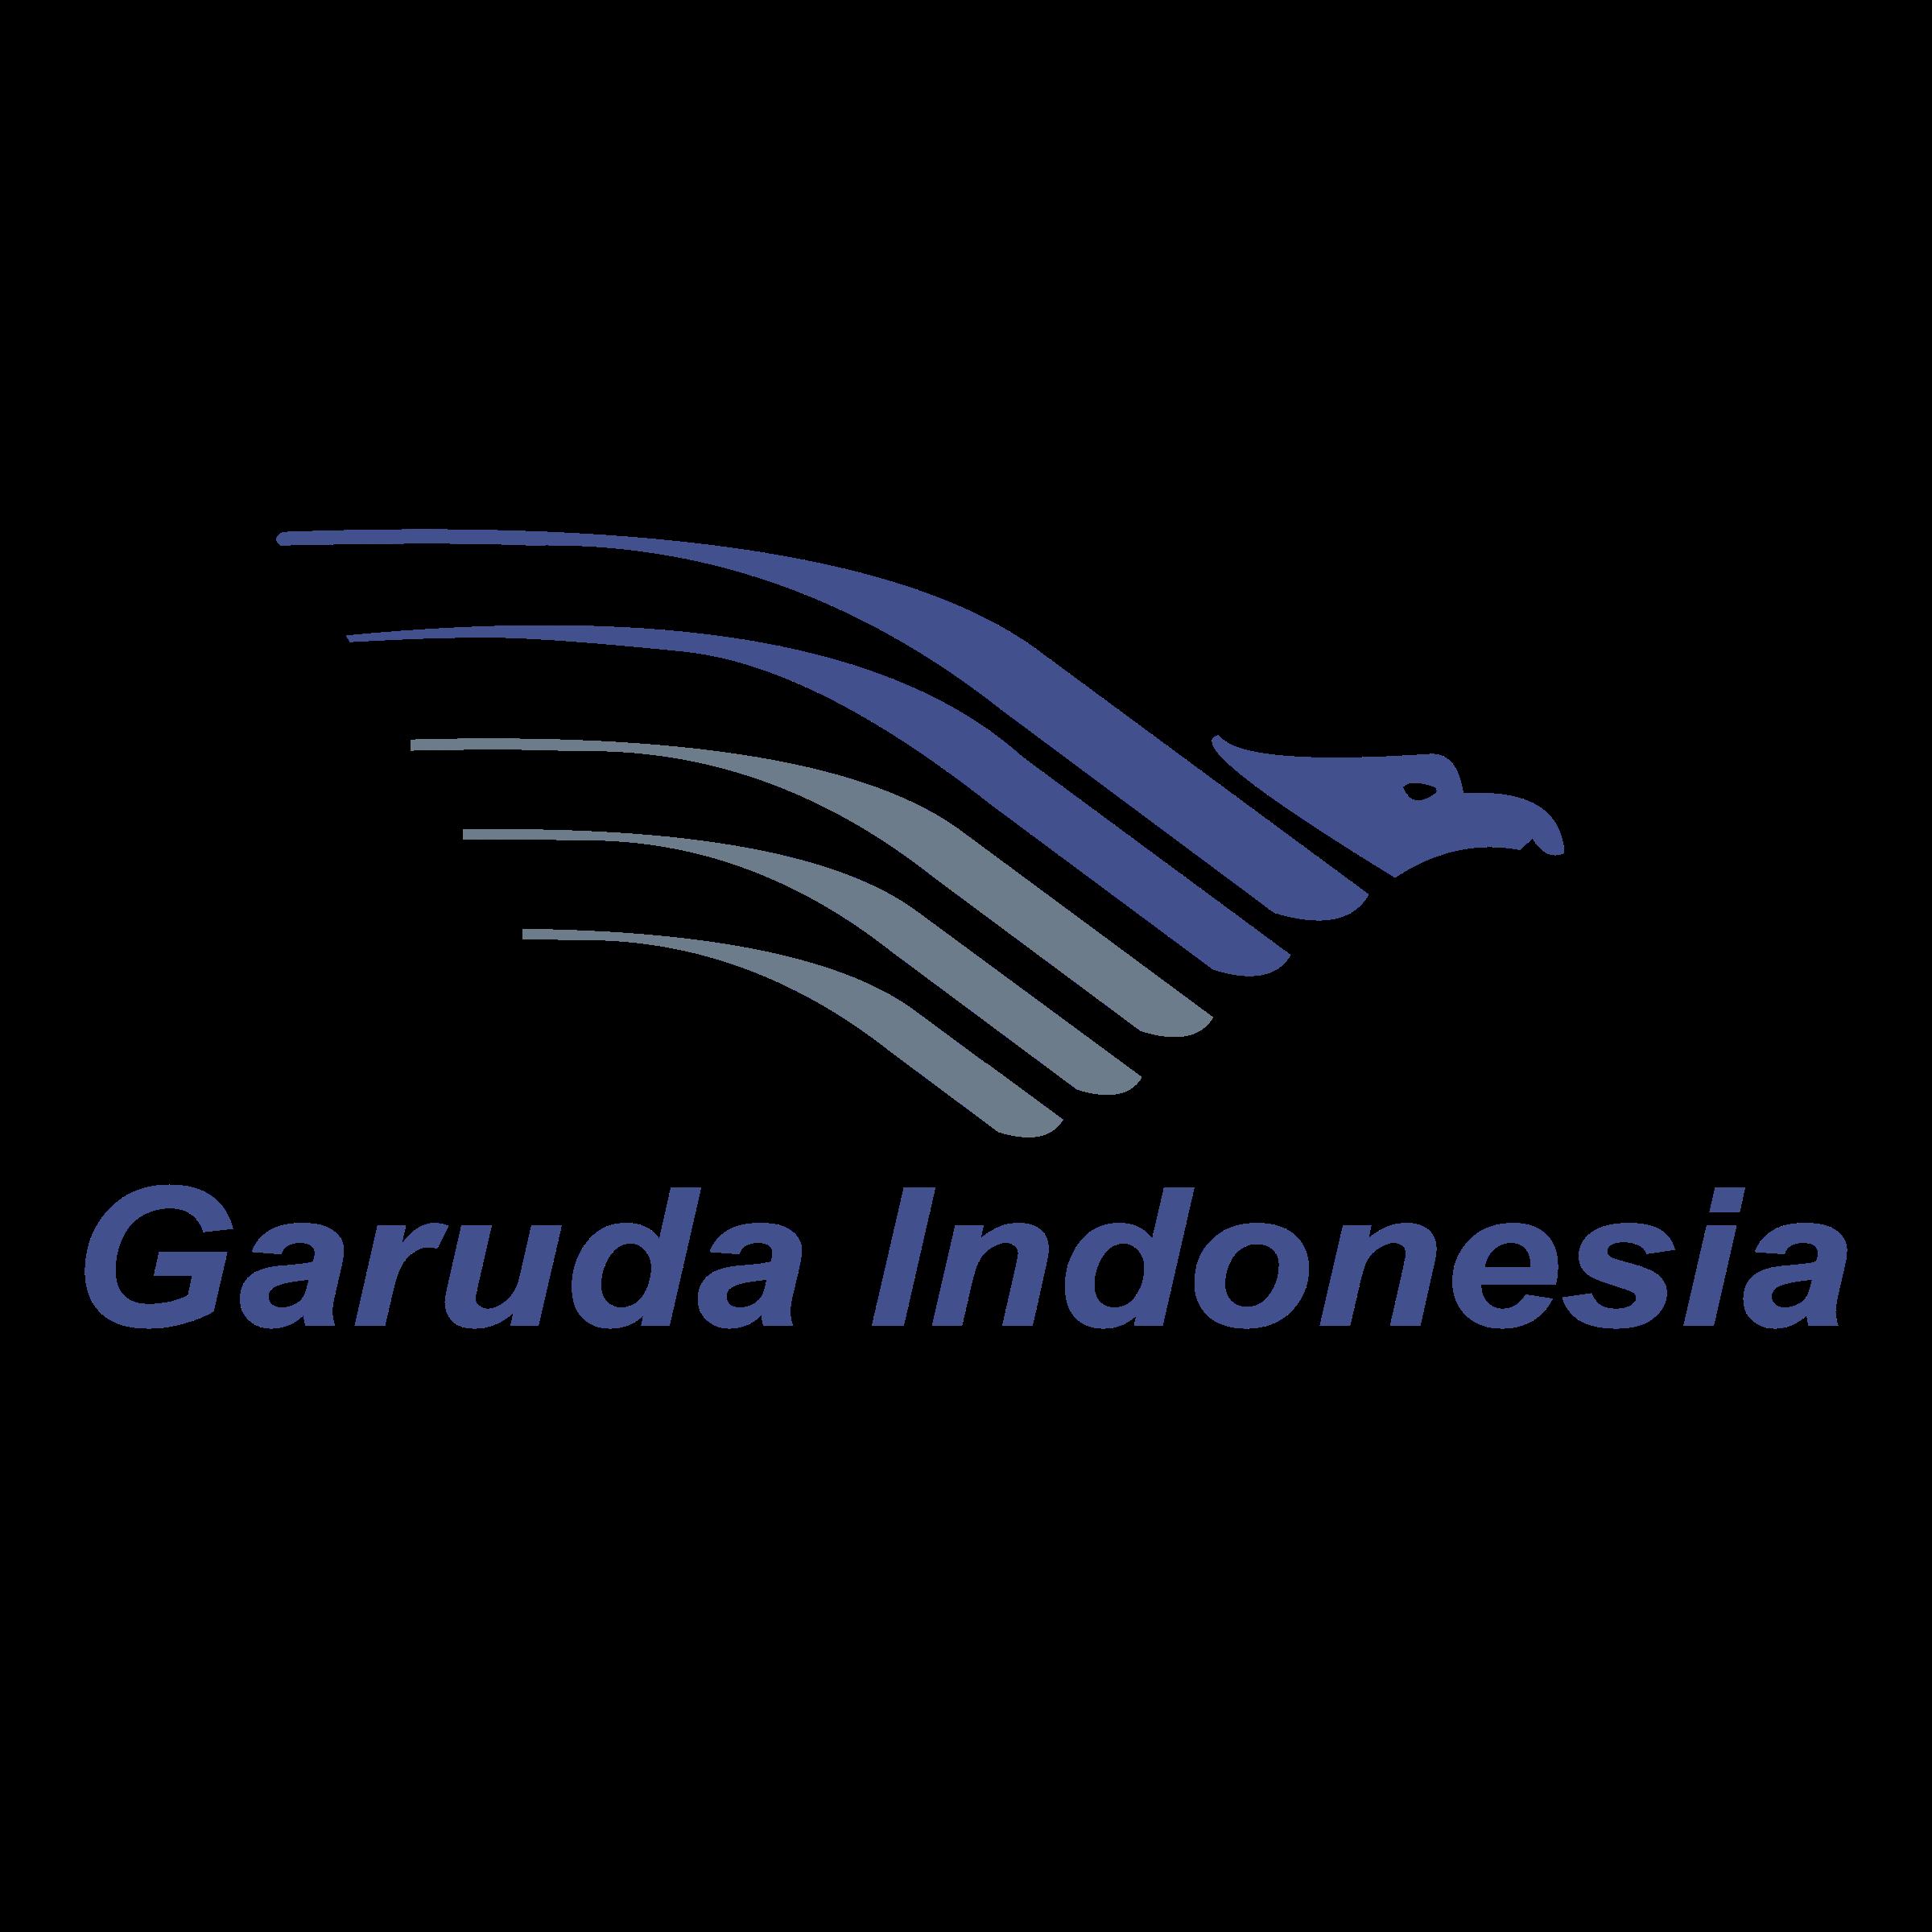 ce3f522ee4c Garuda Indonesia Logo PNG Transparent   SVG Vector - Freebie Supply